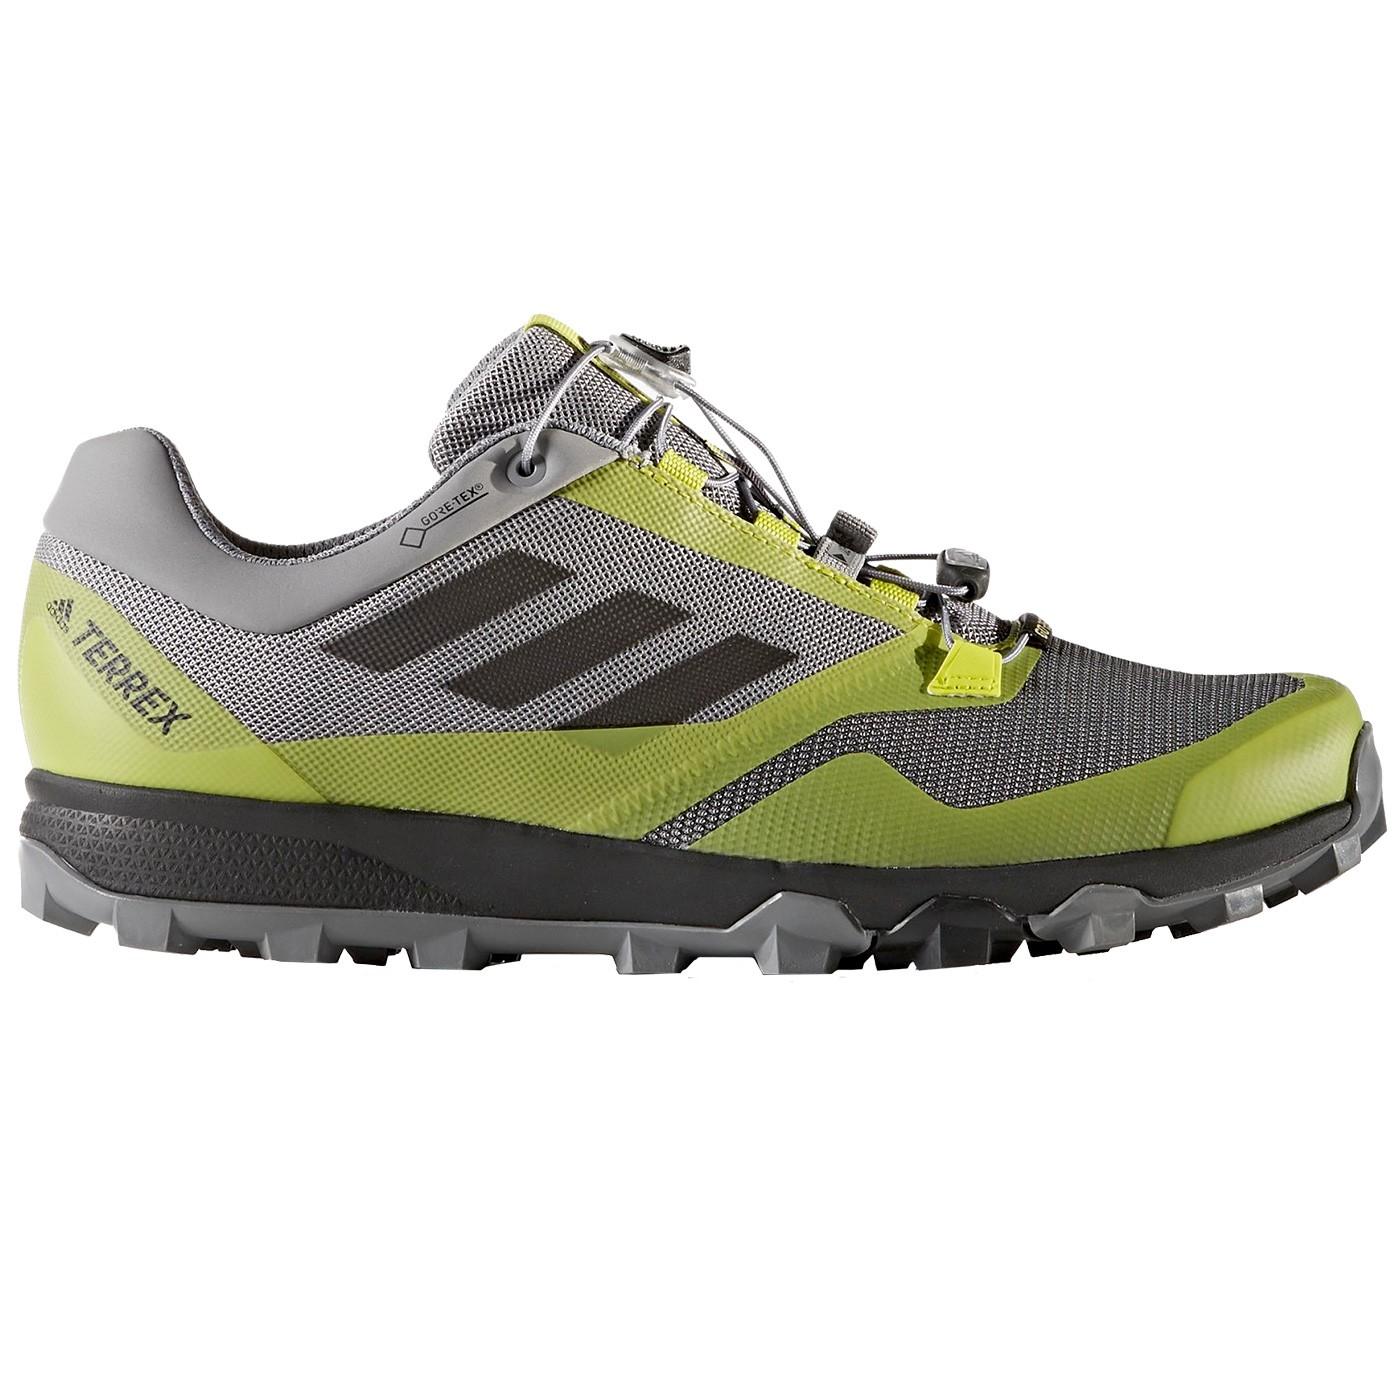 Trekking shoes Adidas Terrex Trailmarker Gtx Man - Trekking shoes 3e877407b